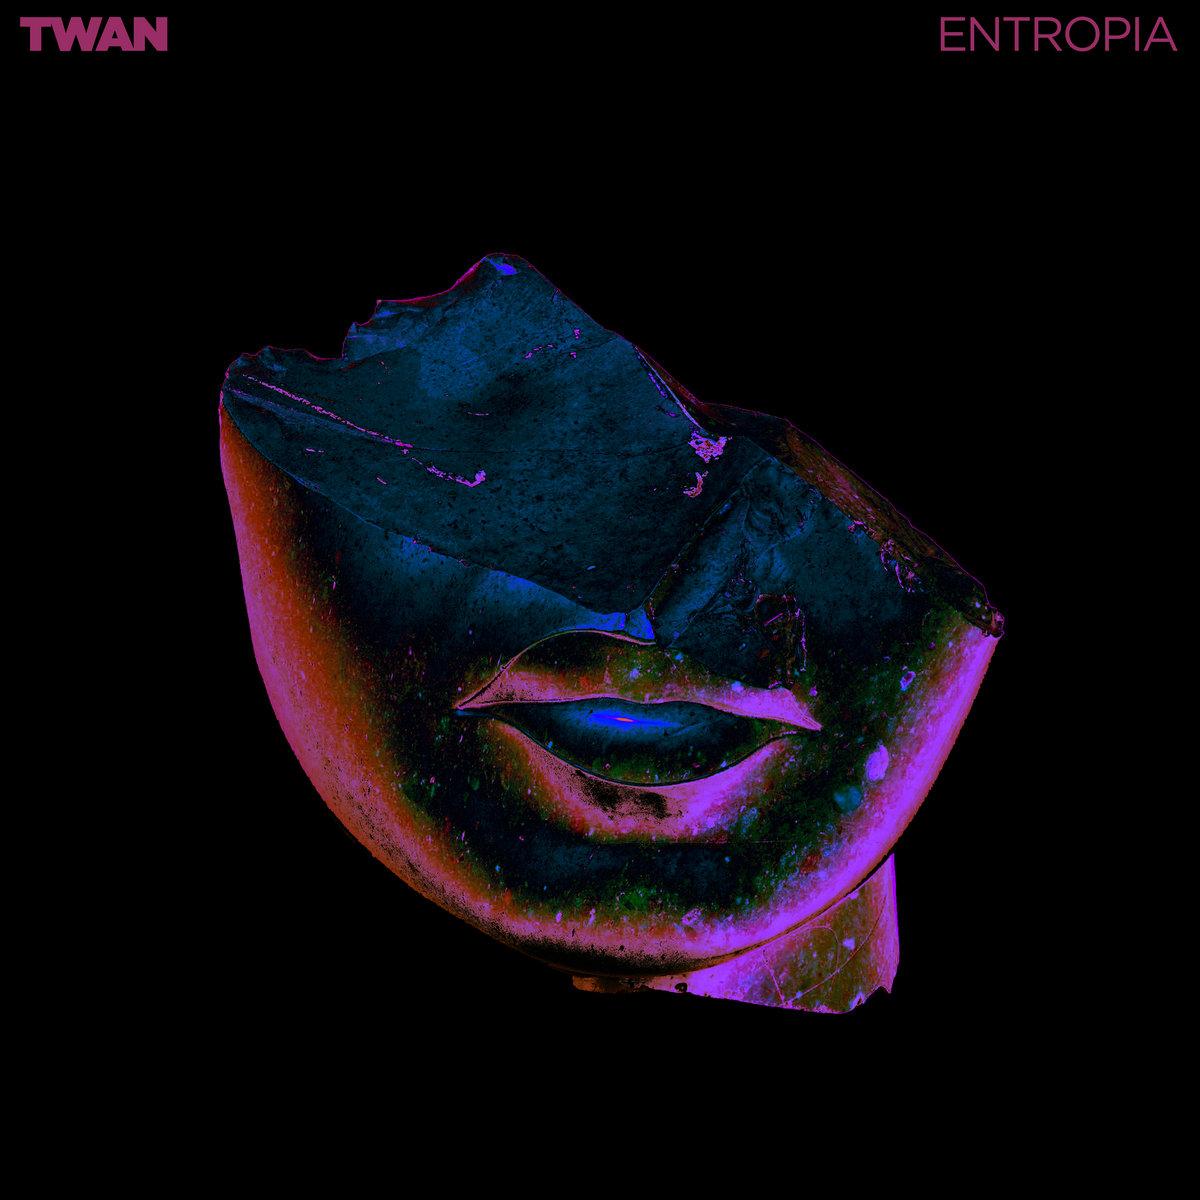 TWAN - Entropia (single)